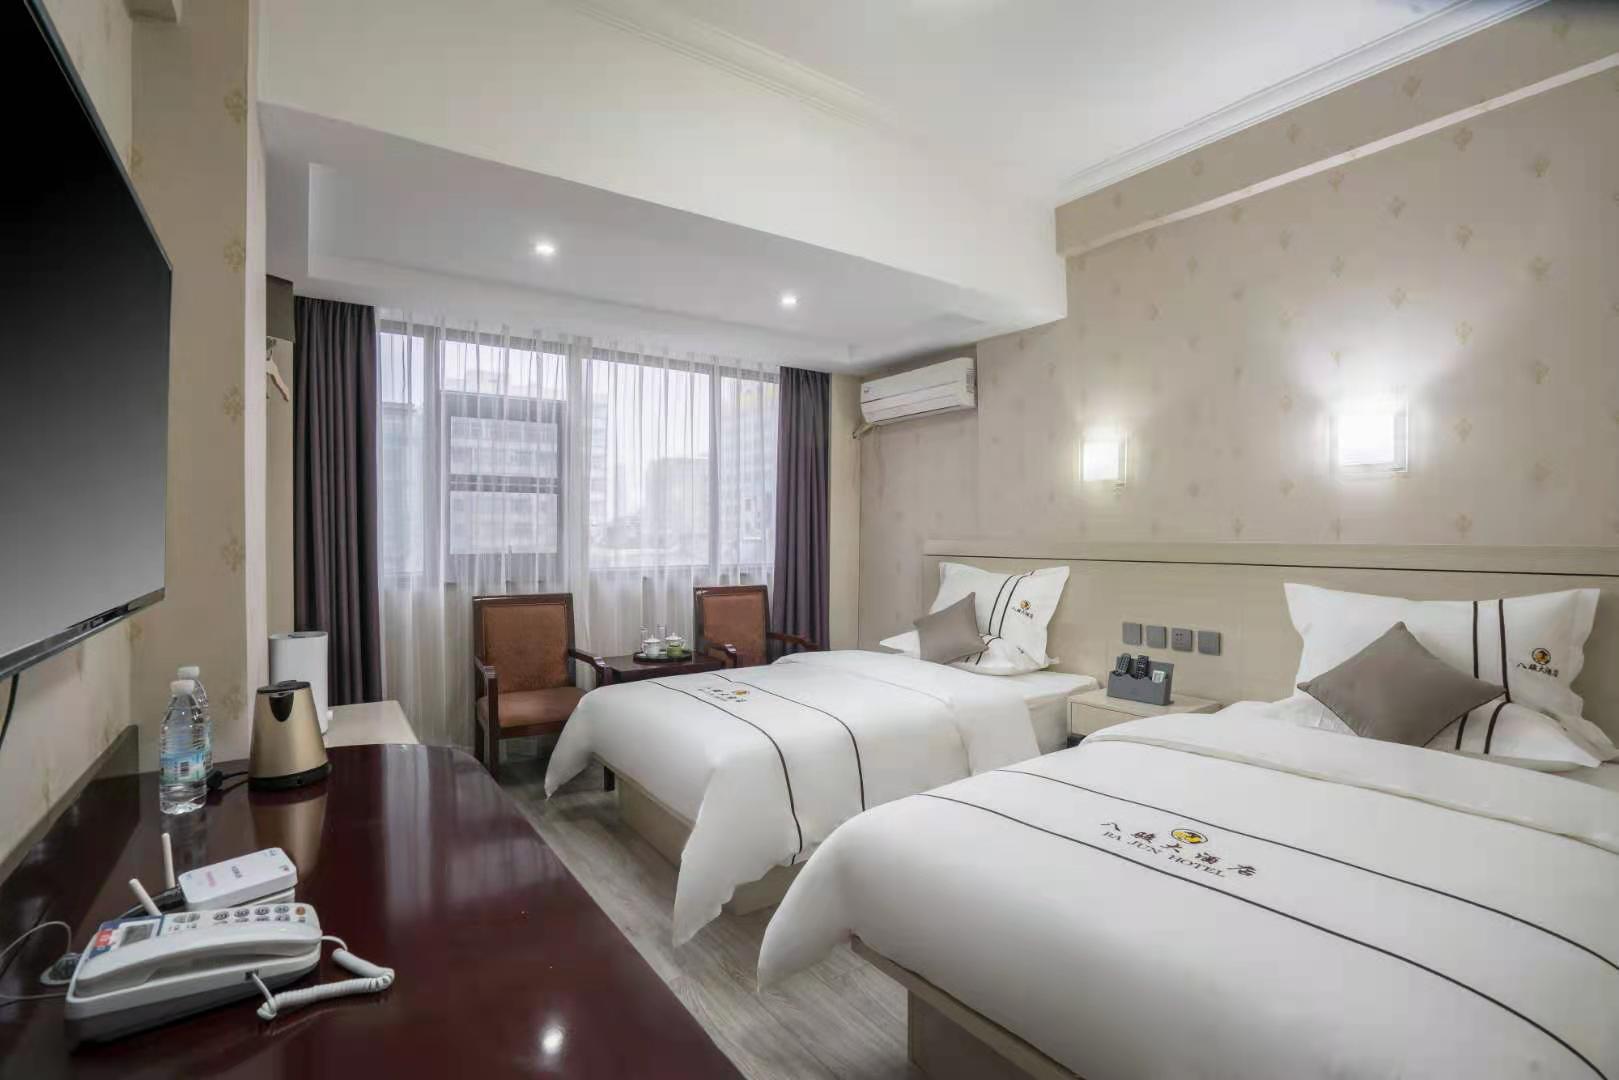 188bet官网手机版下载酒店